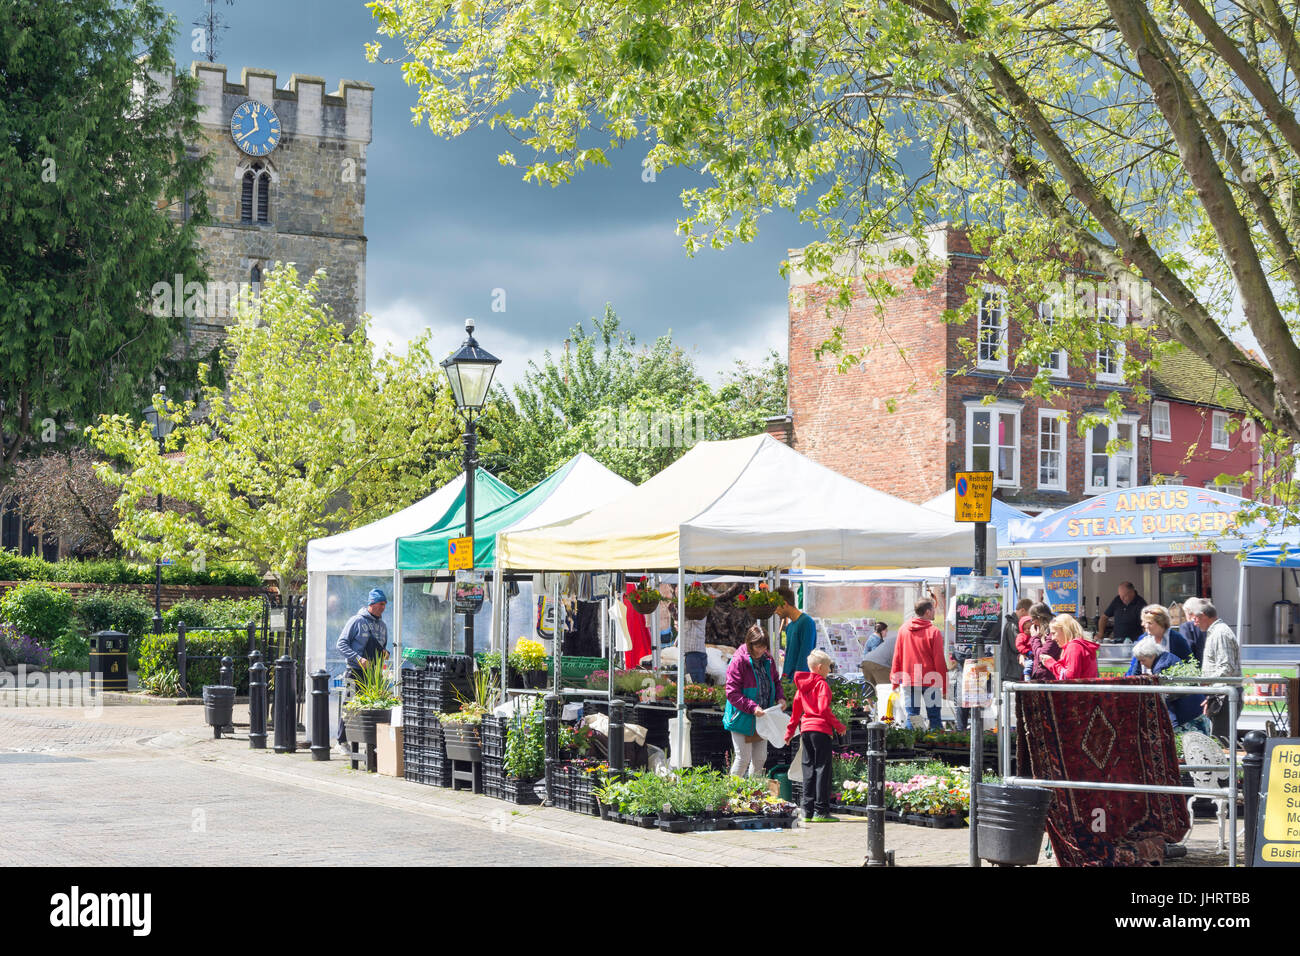 Hampshire Farmers' Market in The Square, Petersfield, Hampshire, England, United Kingdom - Stock Image